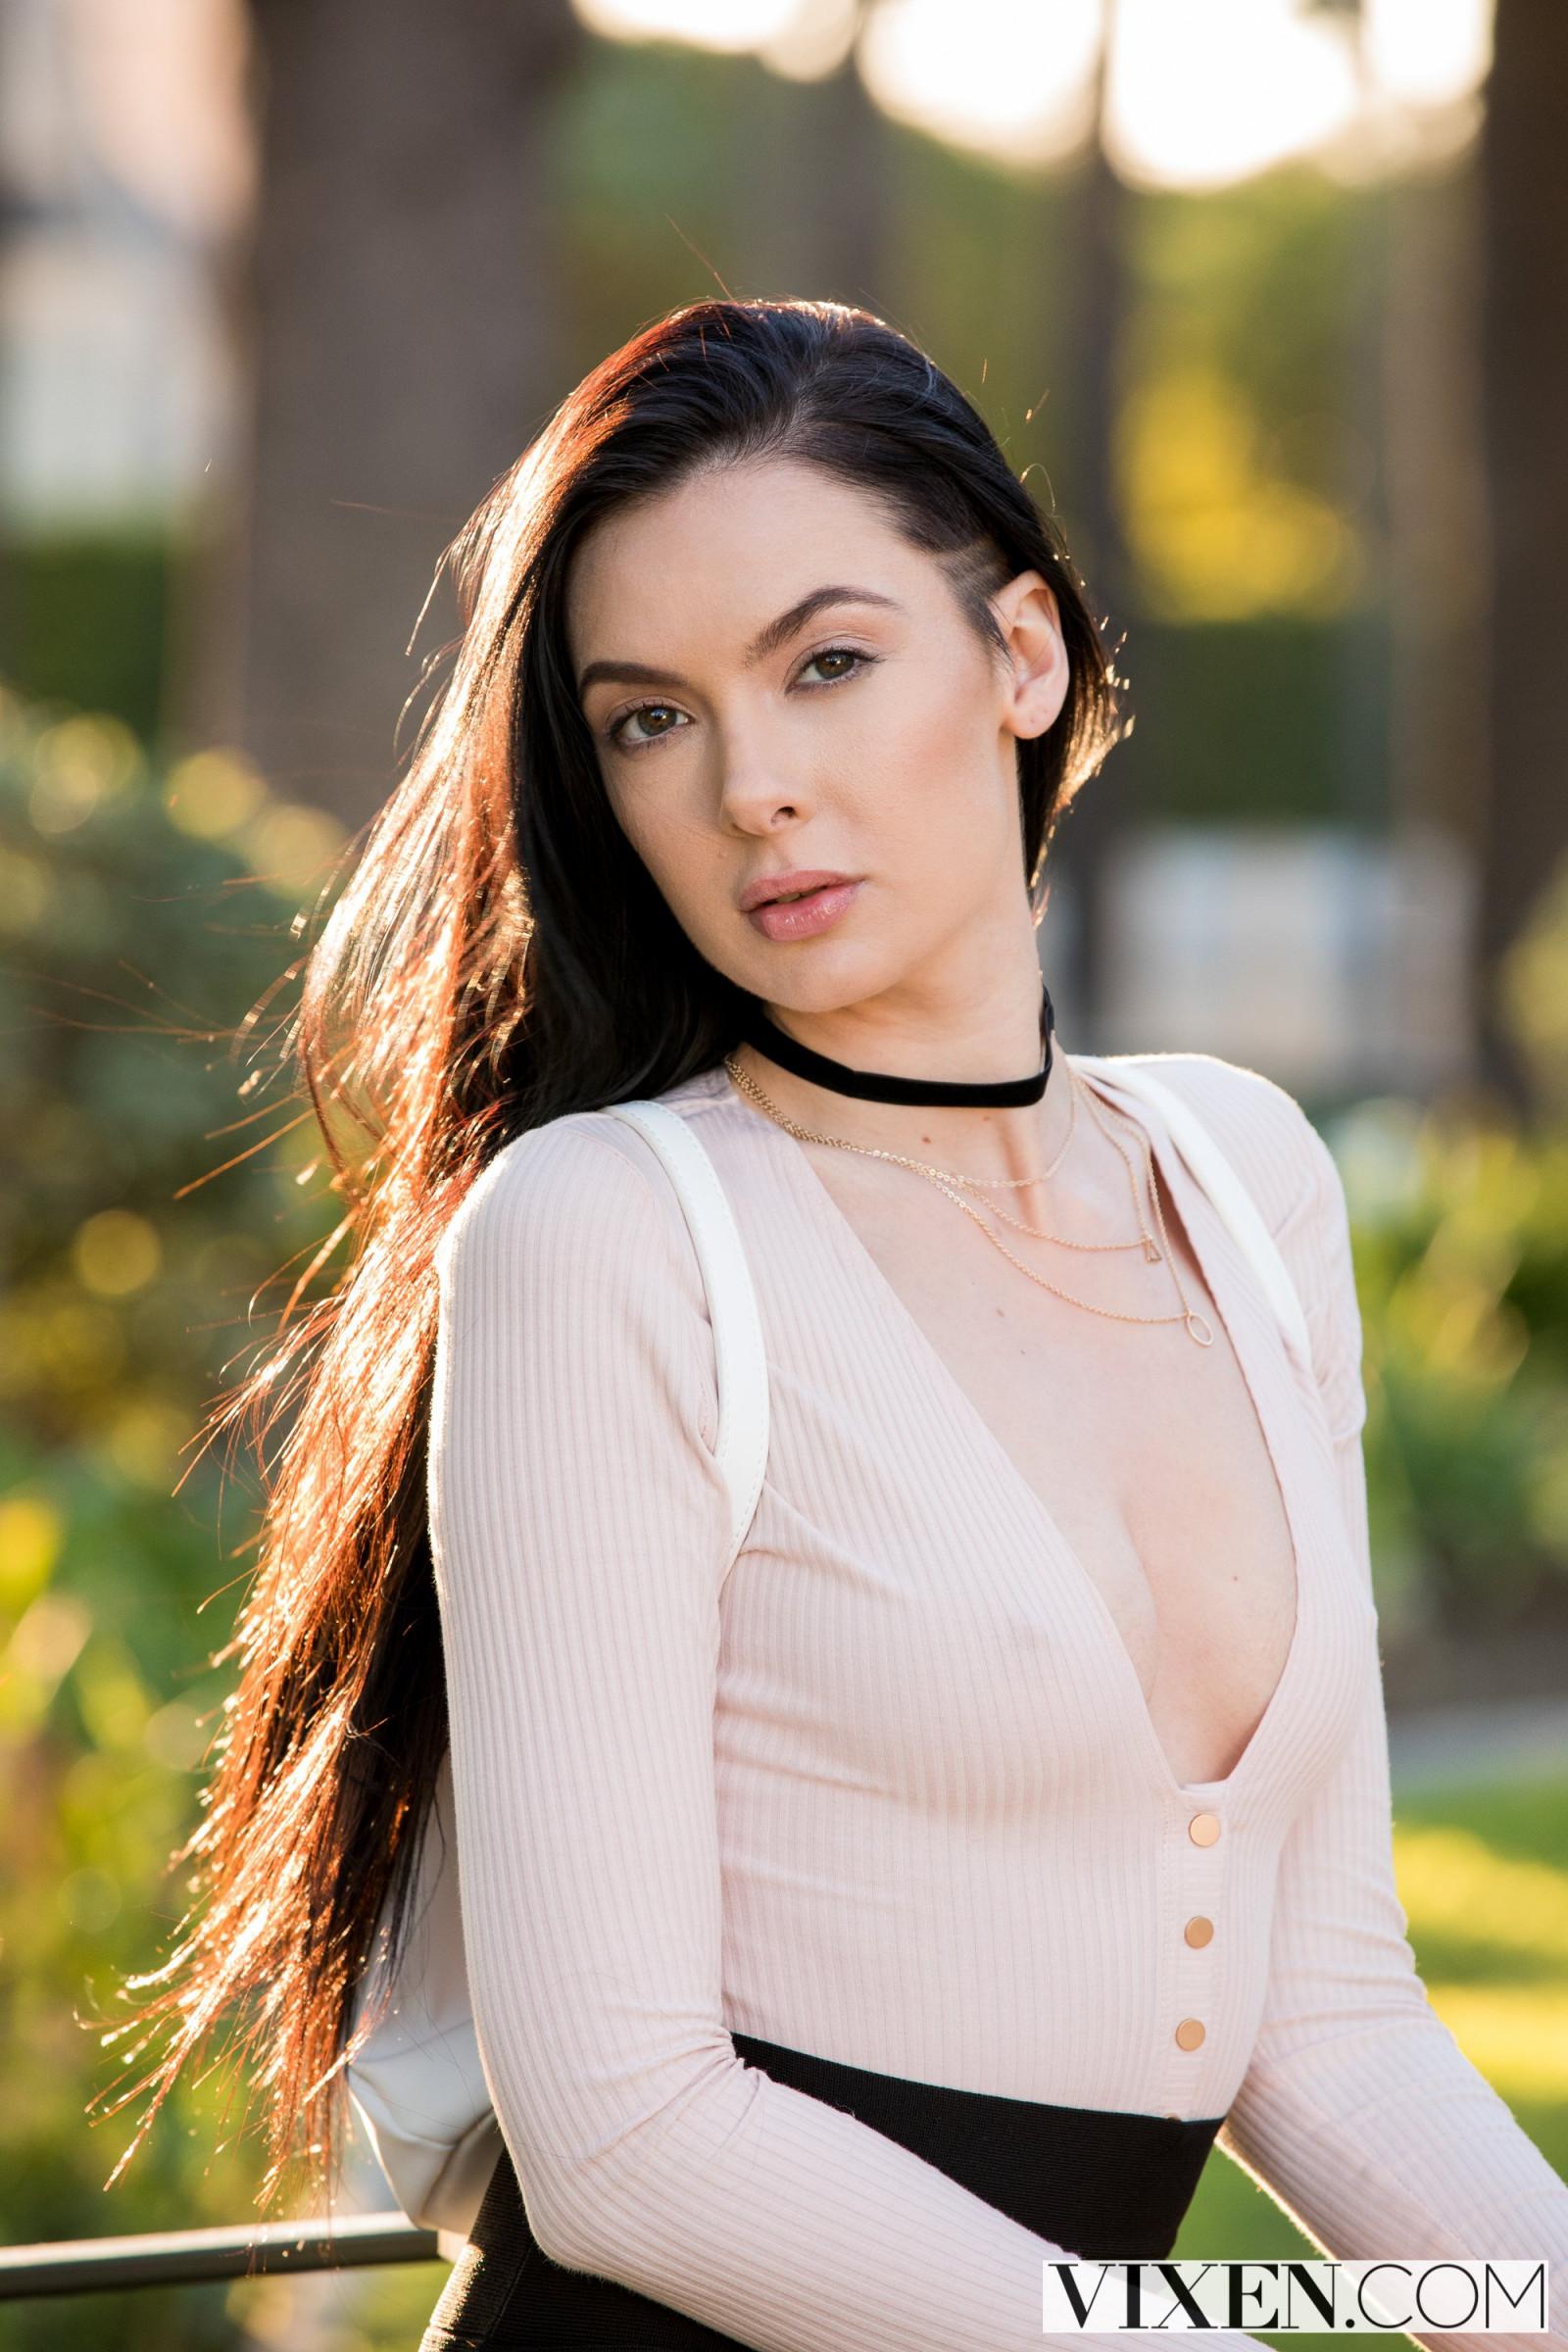 Wallpaper : Marley Brinx, model, actress, pornstar